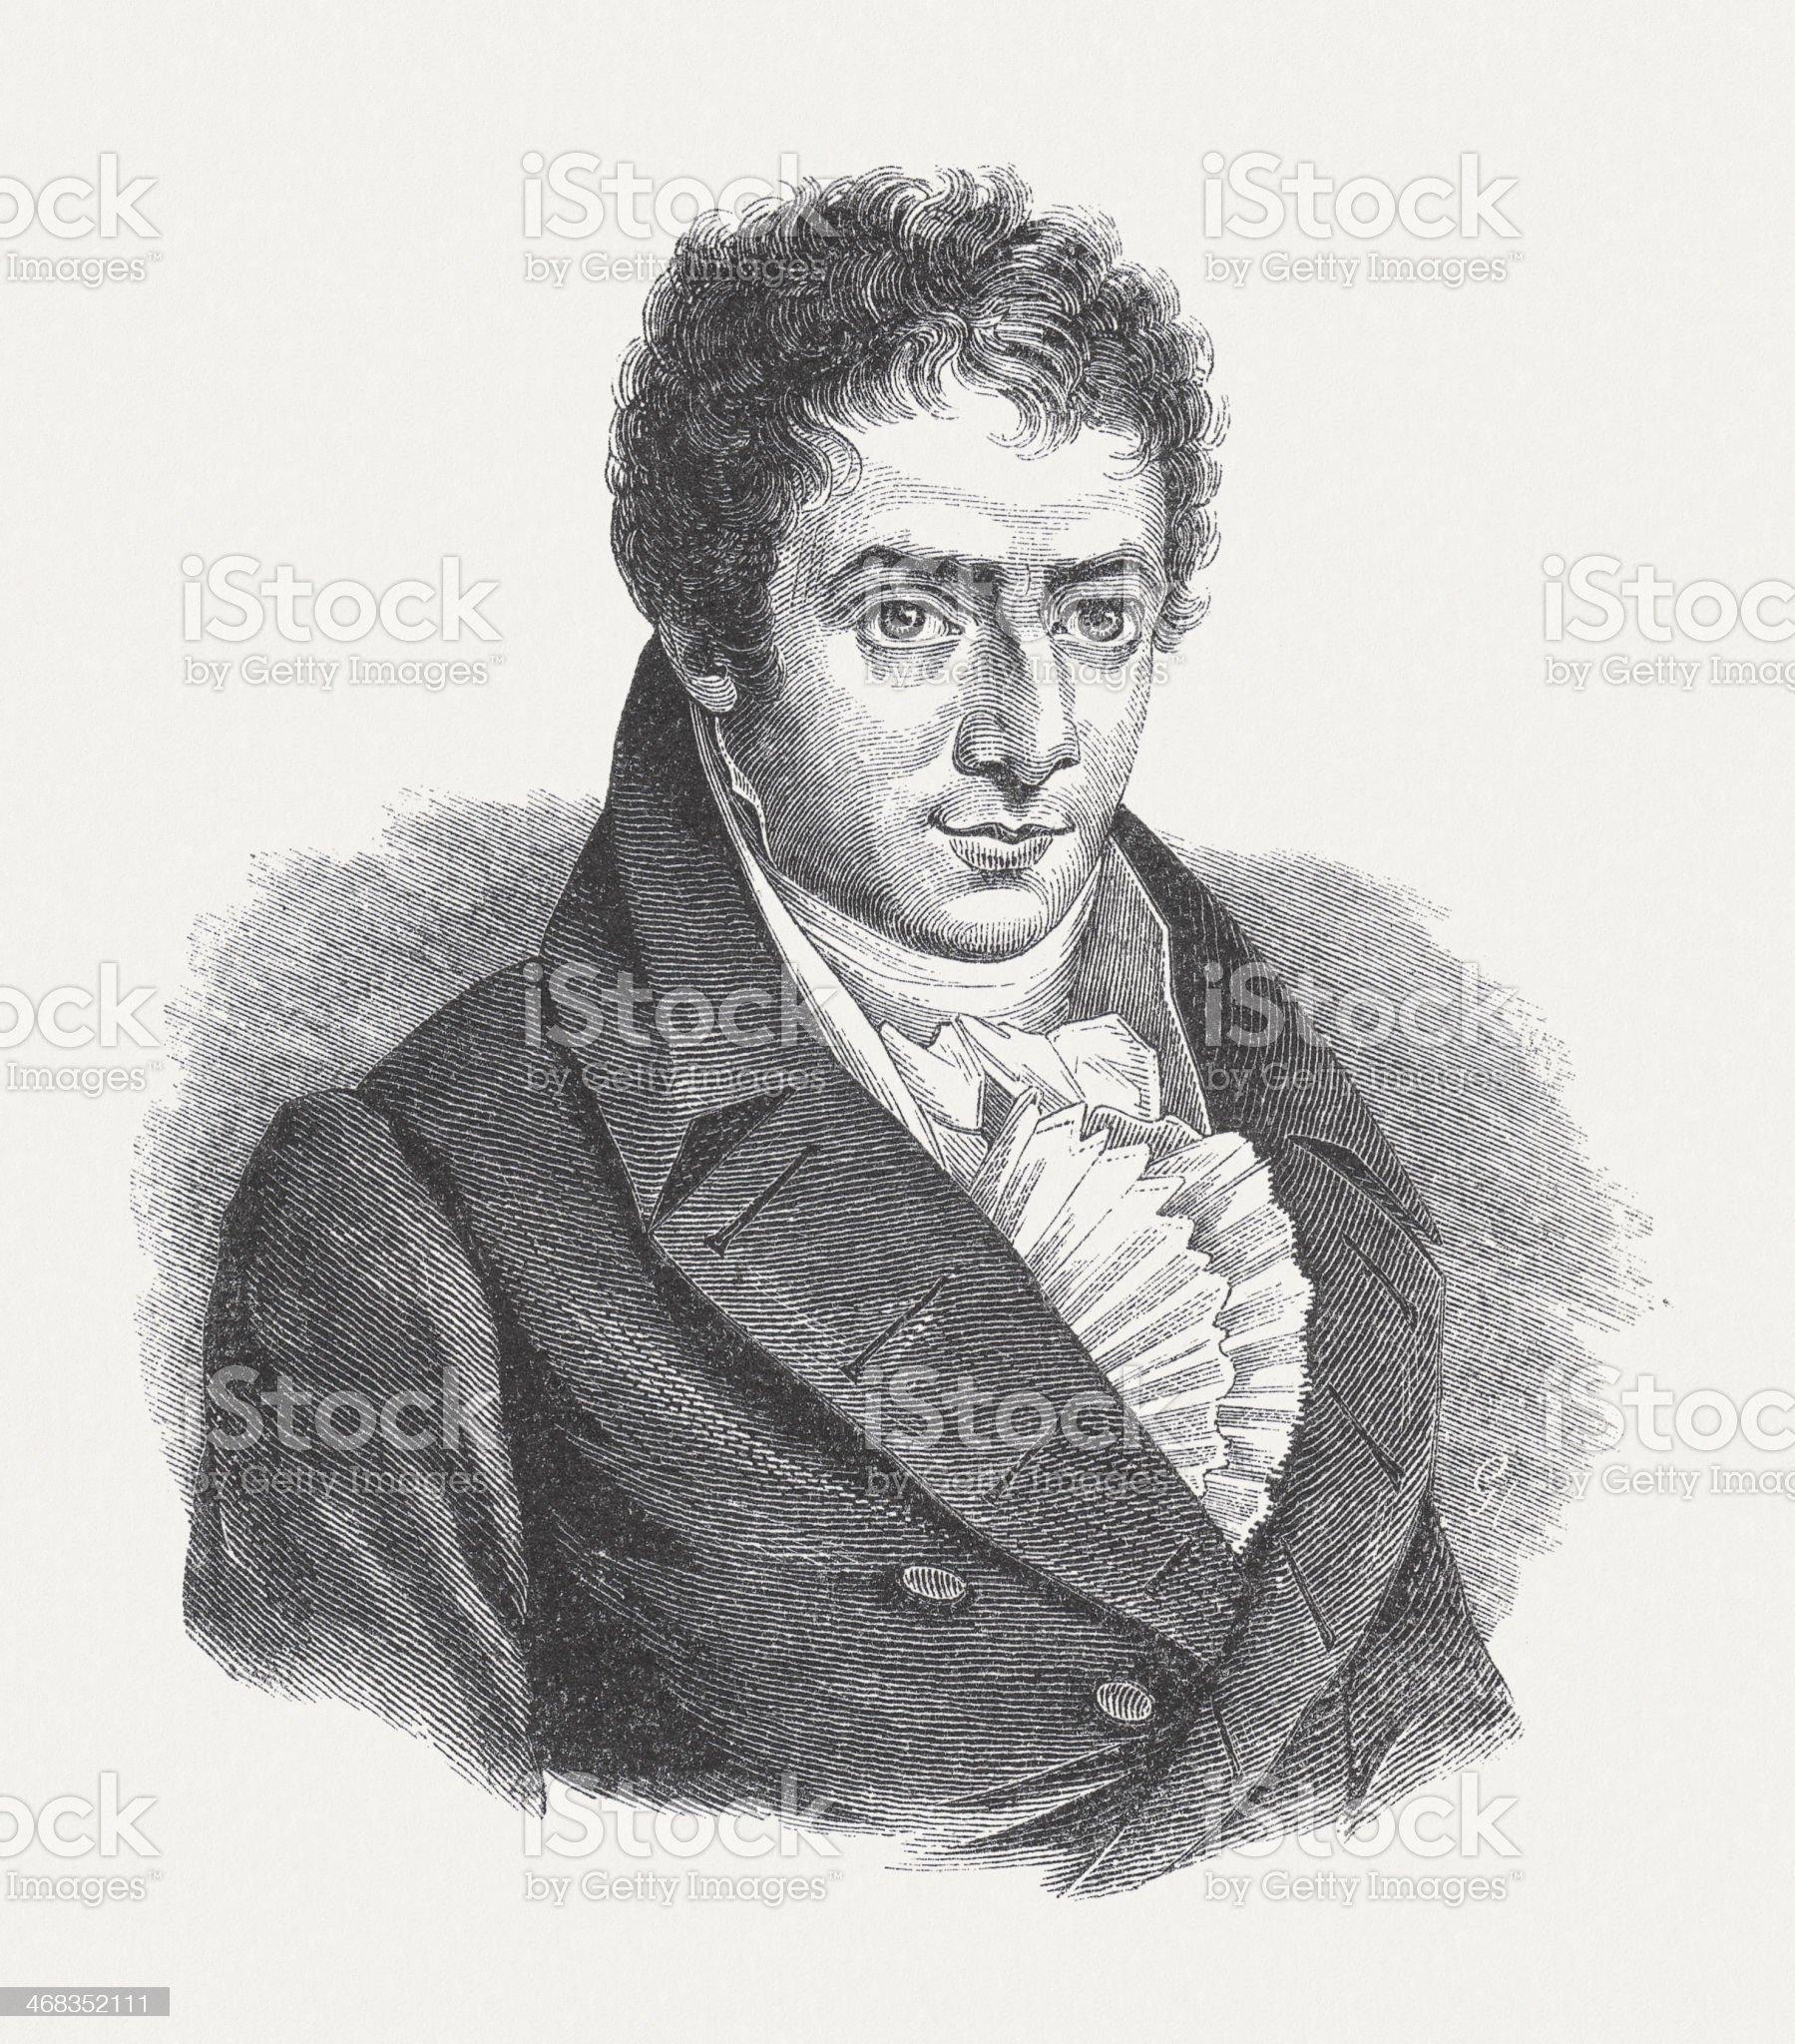 Robert Fulton (1765-1815), American engineer, wood engraving, published in 1851 royalty-free stock vector art